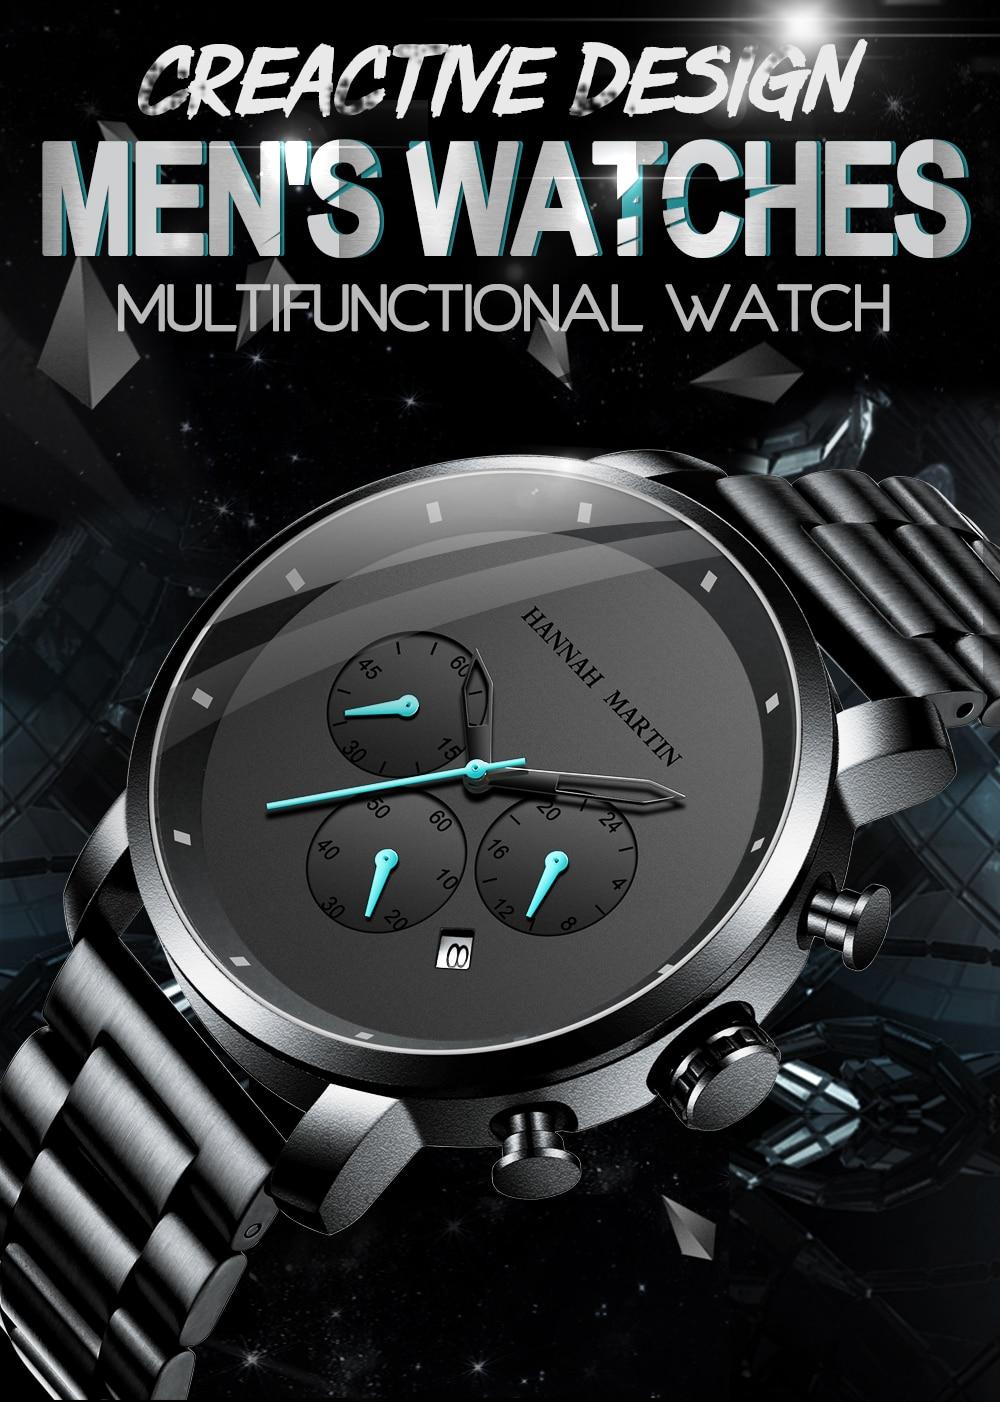 H4b85e633ba314c9eab57e2b62a267725l DropShipping Big Dial 45mm Full Black Stainless Steel Multi-function Calendar Men's Top Brand Luxury Watches Relogio Masculino